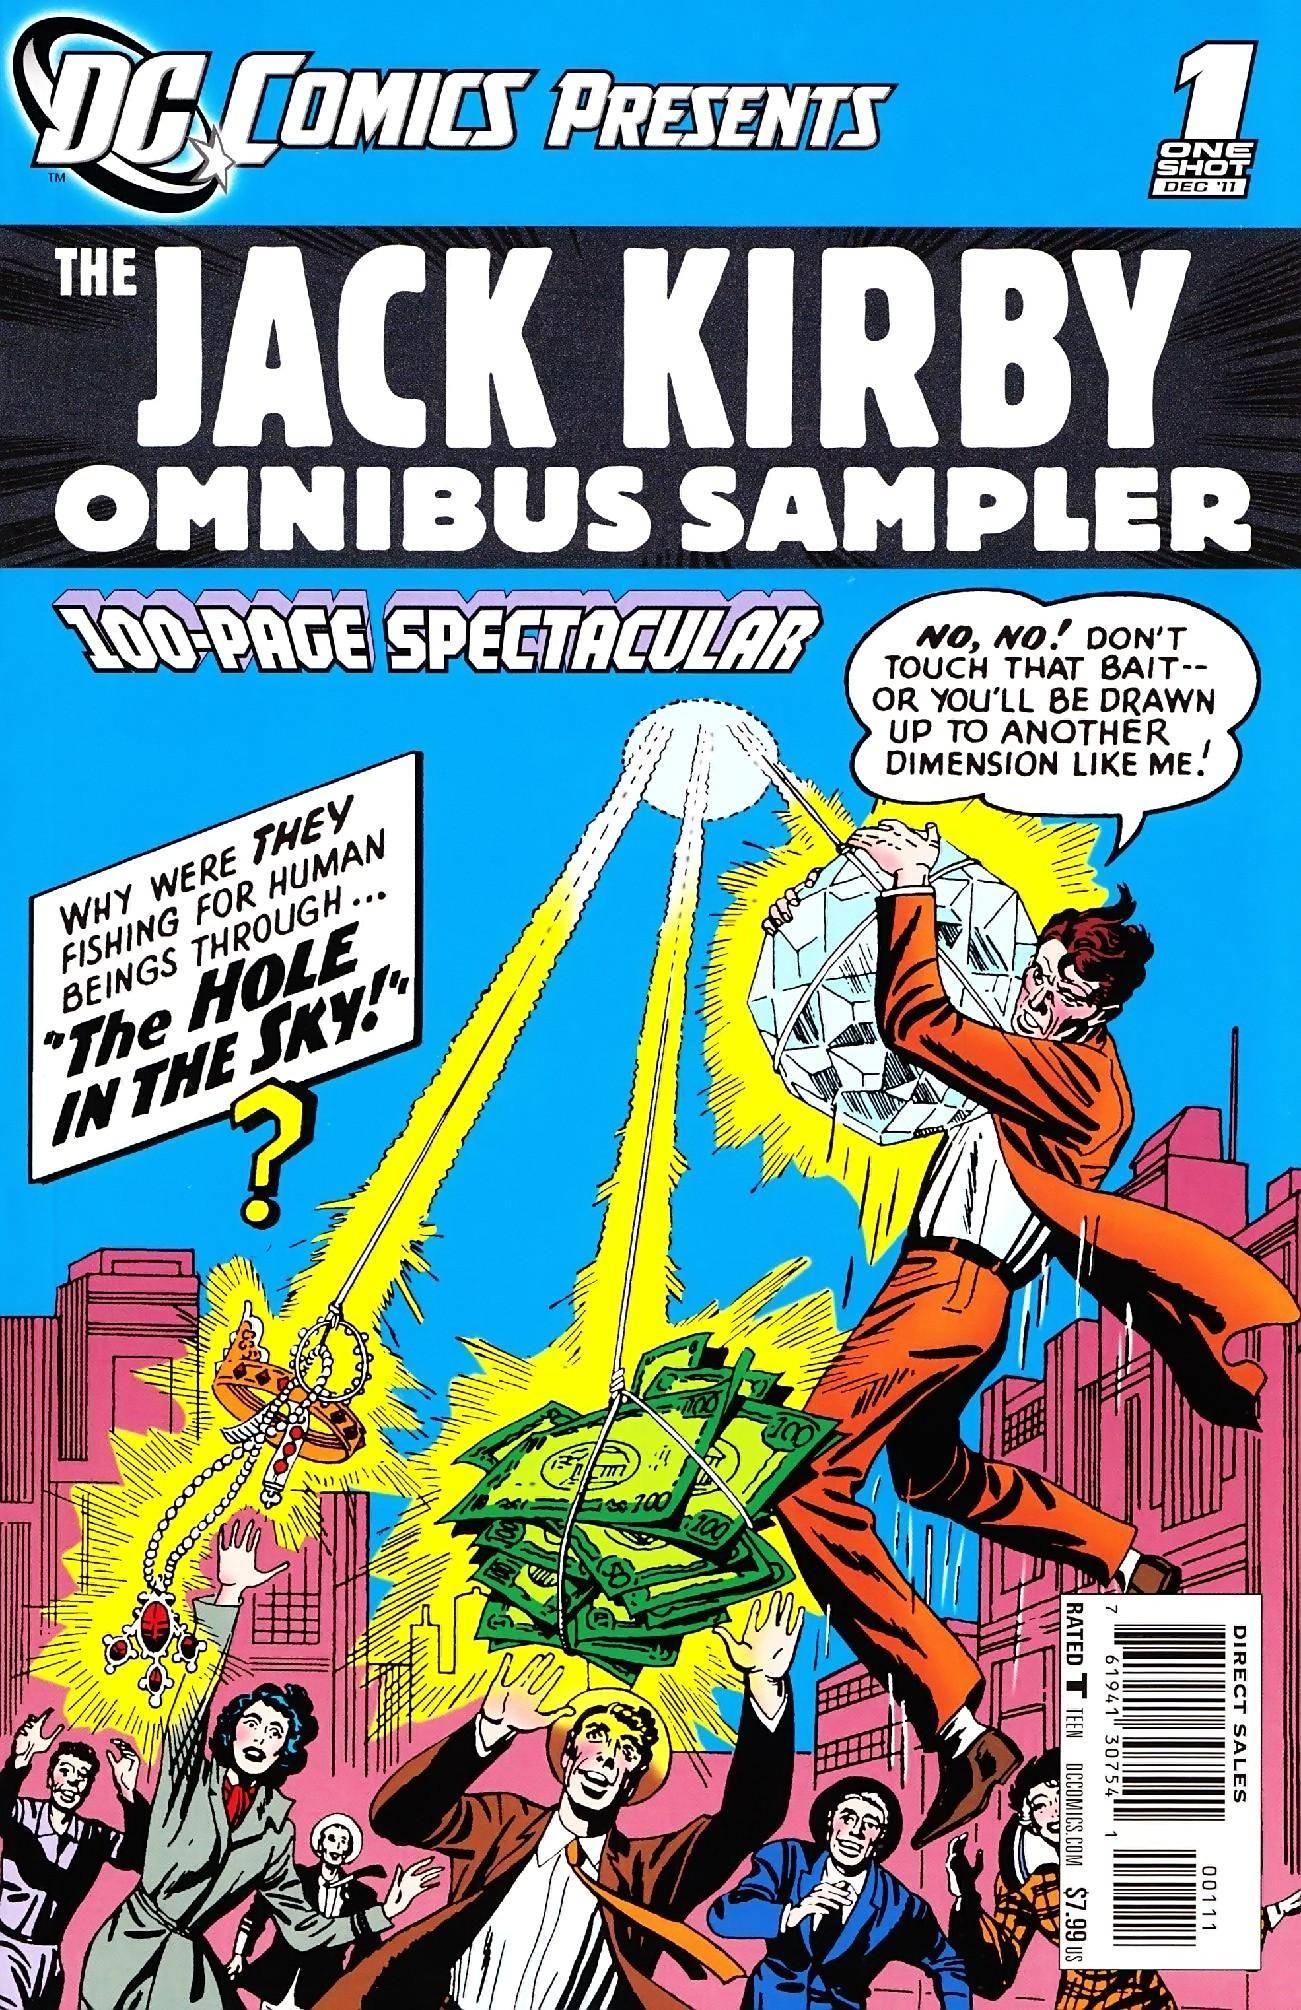 DC Comics Presents - Jack Kirby Omnibus Sampler 001 2011 102p re-em-dcp